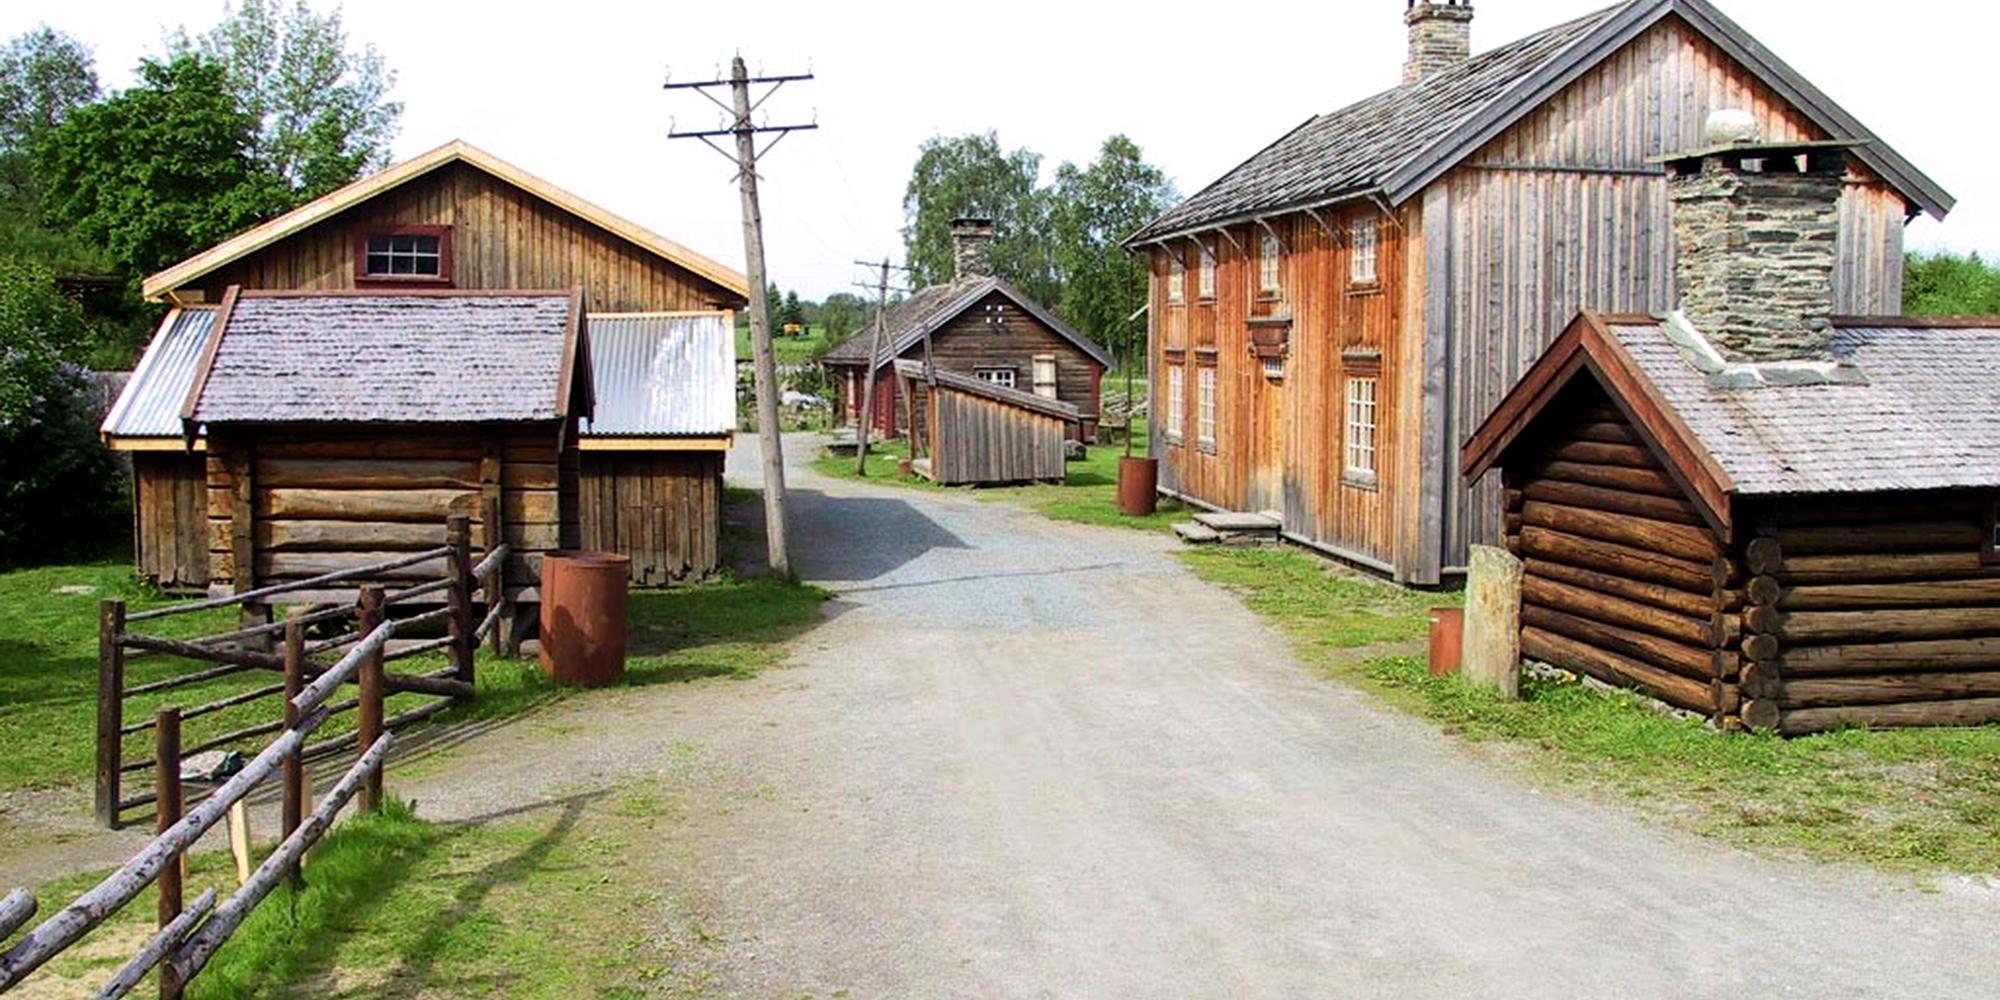 Stiklestad Nasjonale Kultursenter - The folk museum With several building. Copyright: Stiklestad Nasjonale Kultursenter